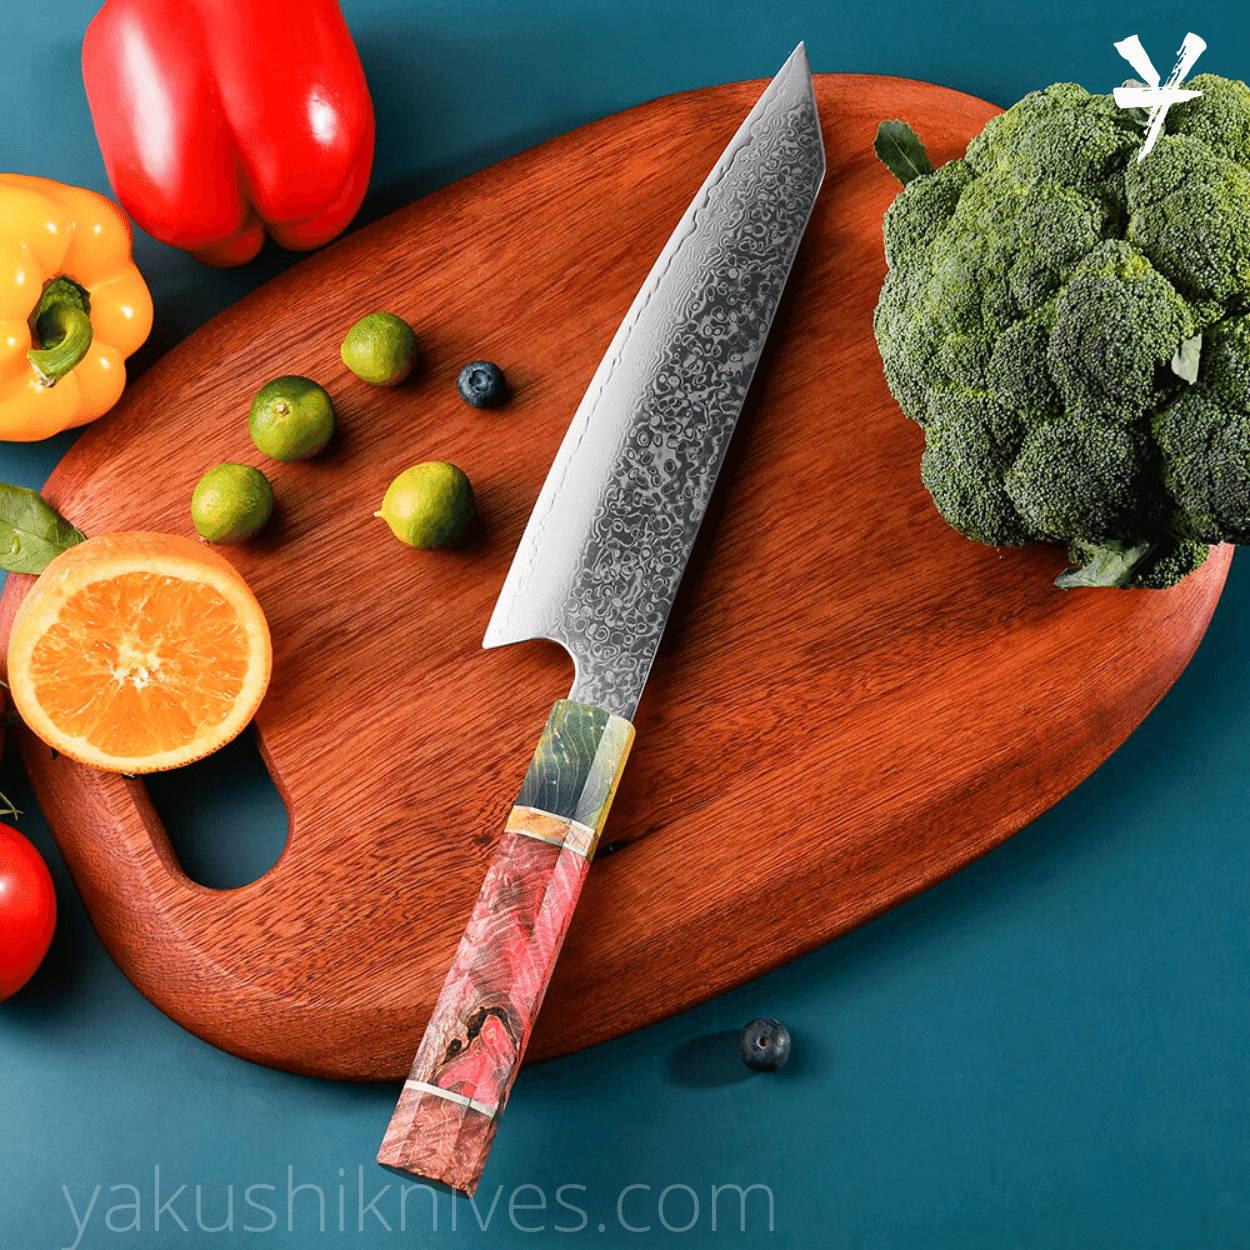 Japanese Chef Knife, Damascus Steel Knives, Damascus Chef Knife, 8inch Kitche Damascus Knife